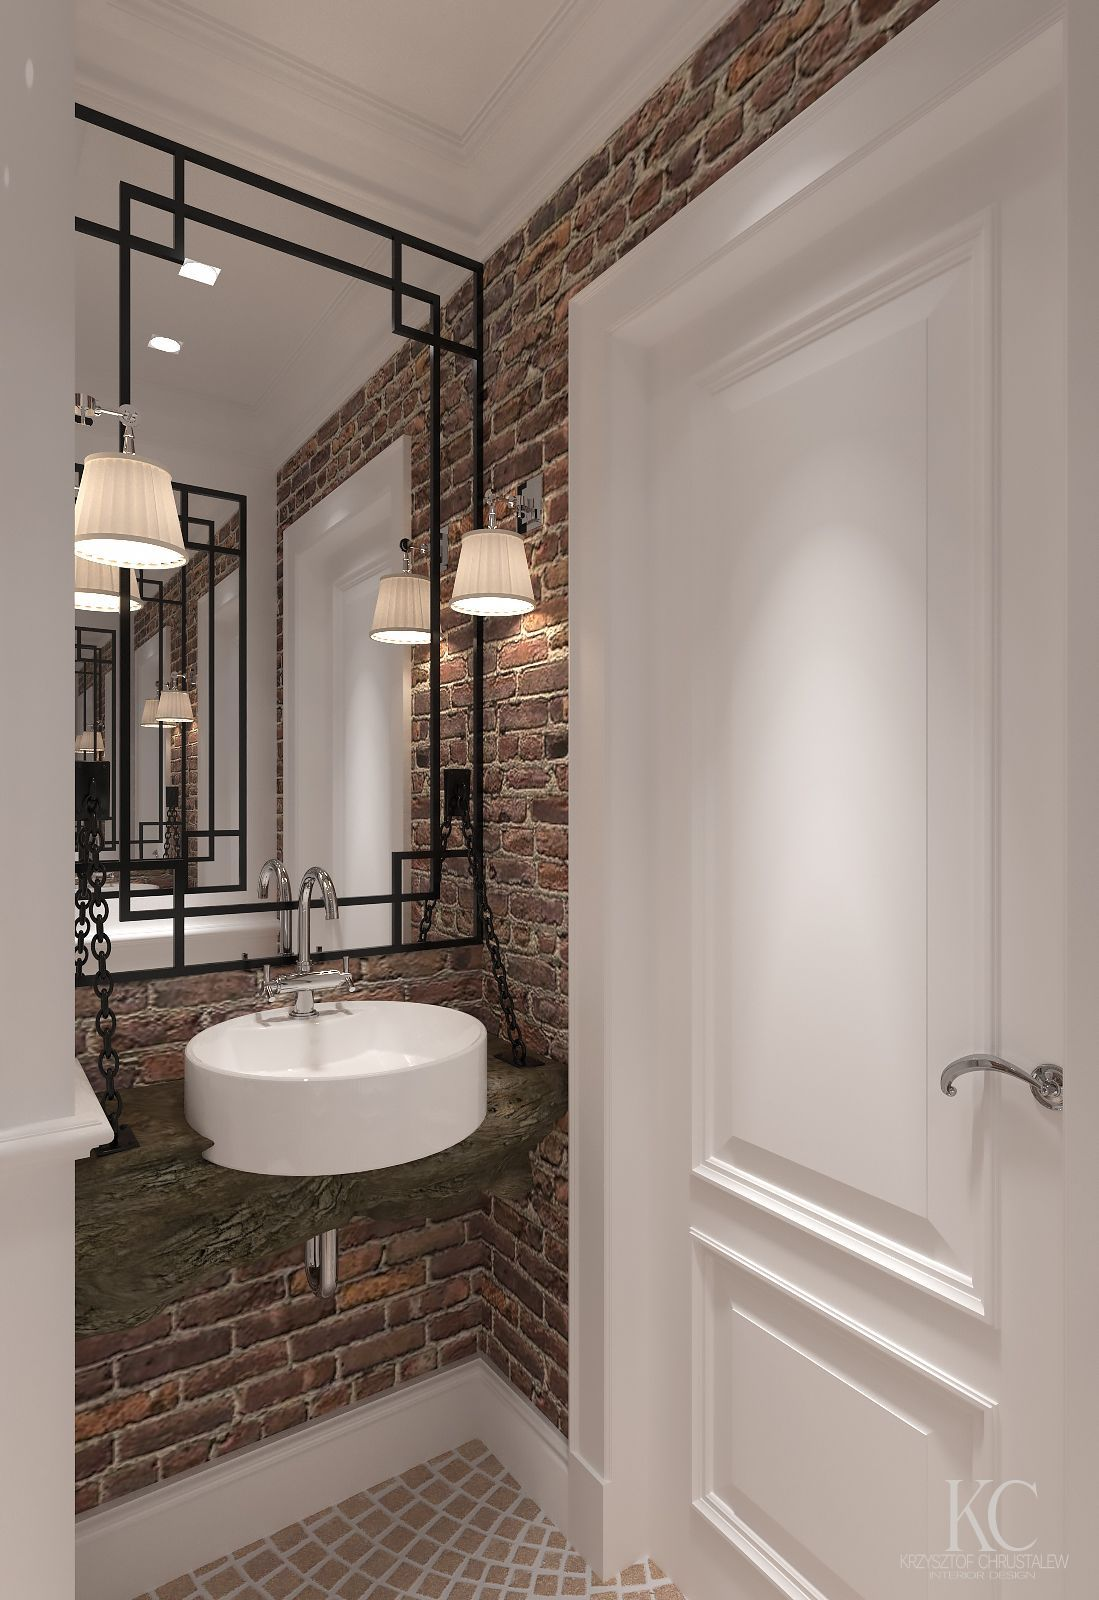 Wc 1 Jpg Small Bathroom Decor Bathroom Interior Design Bathroom Budget Diy